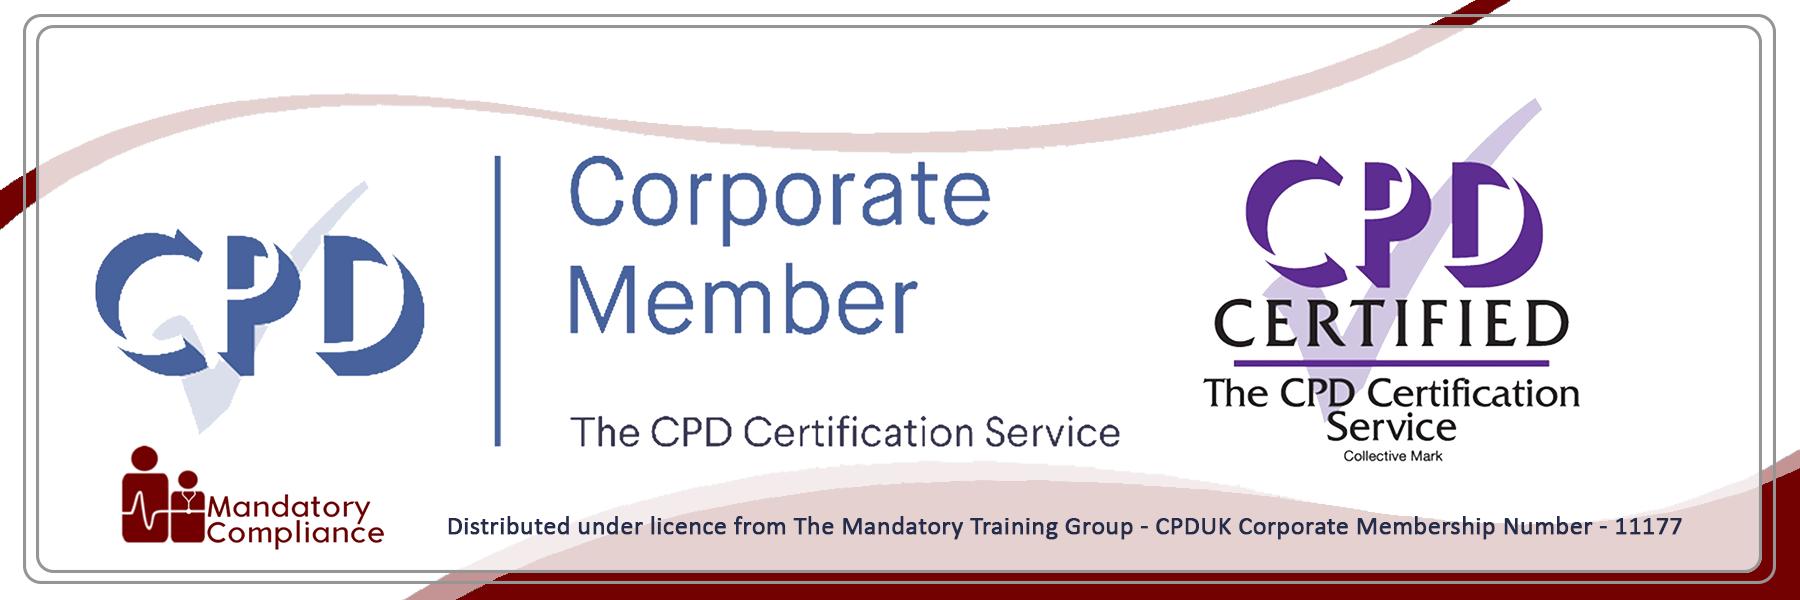 Care Courses - Online Training Courses - Mandatory Compliance UK-